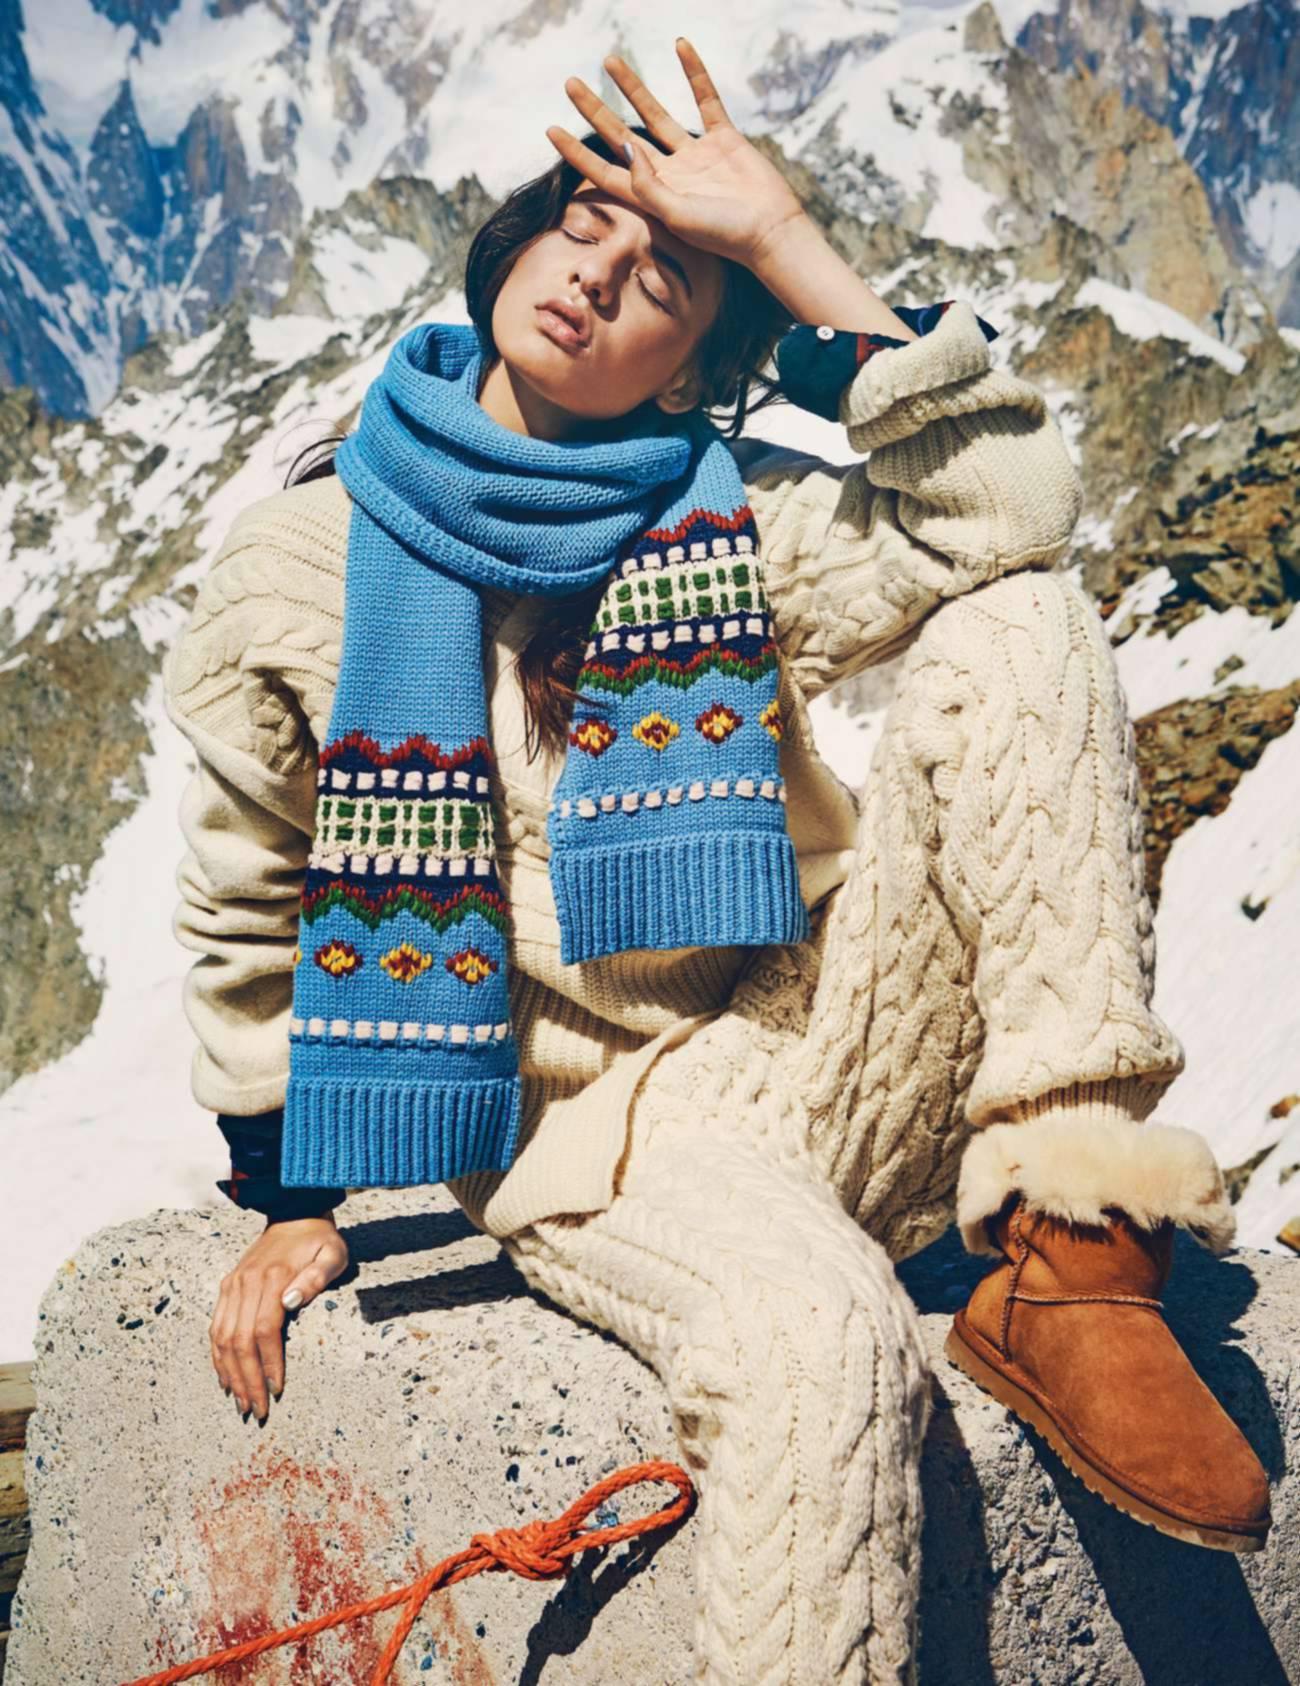 свитер и брюки из шерсти, Joseph; рубашка, Isabel Marant; вышитый шерстяной шарф, Chanel; угги, UGG